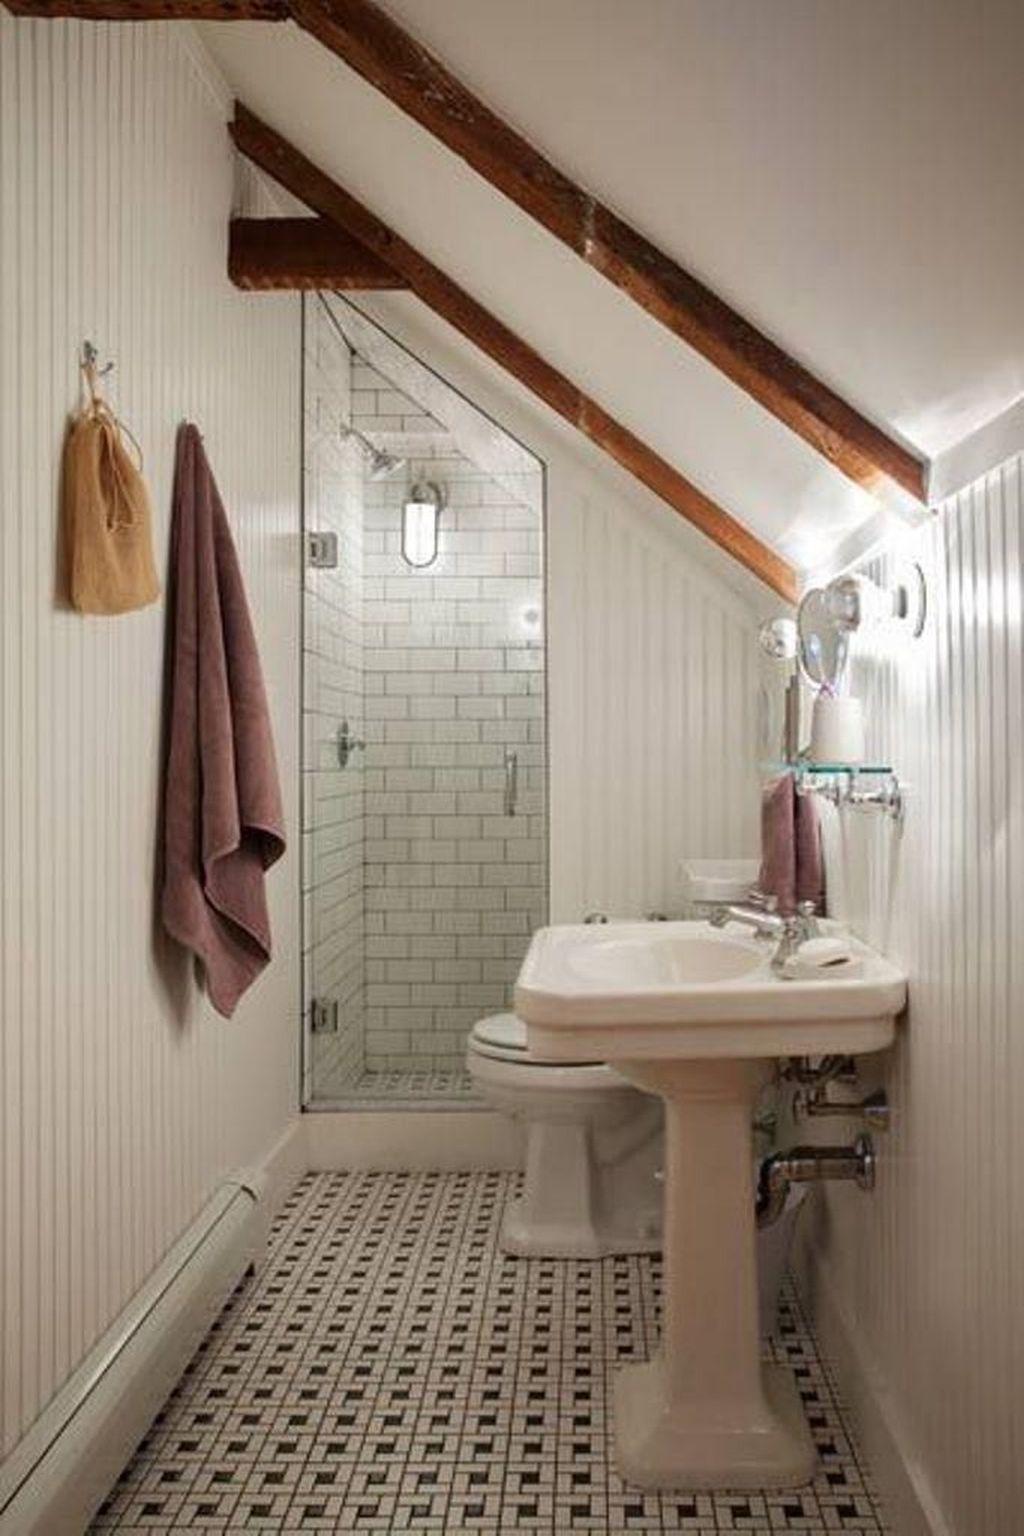 Pin By Saydee Bocanegra On Design Bathrooms Attic Master Bedroom Loft Bathroom Upstairs Bathrooms